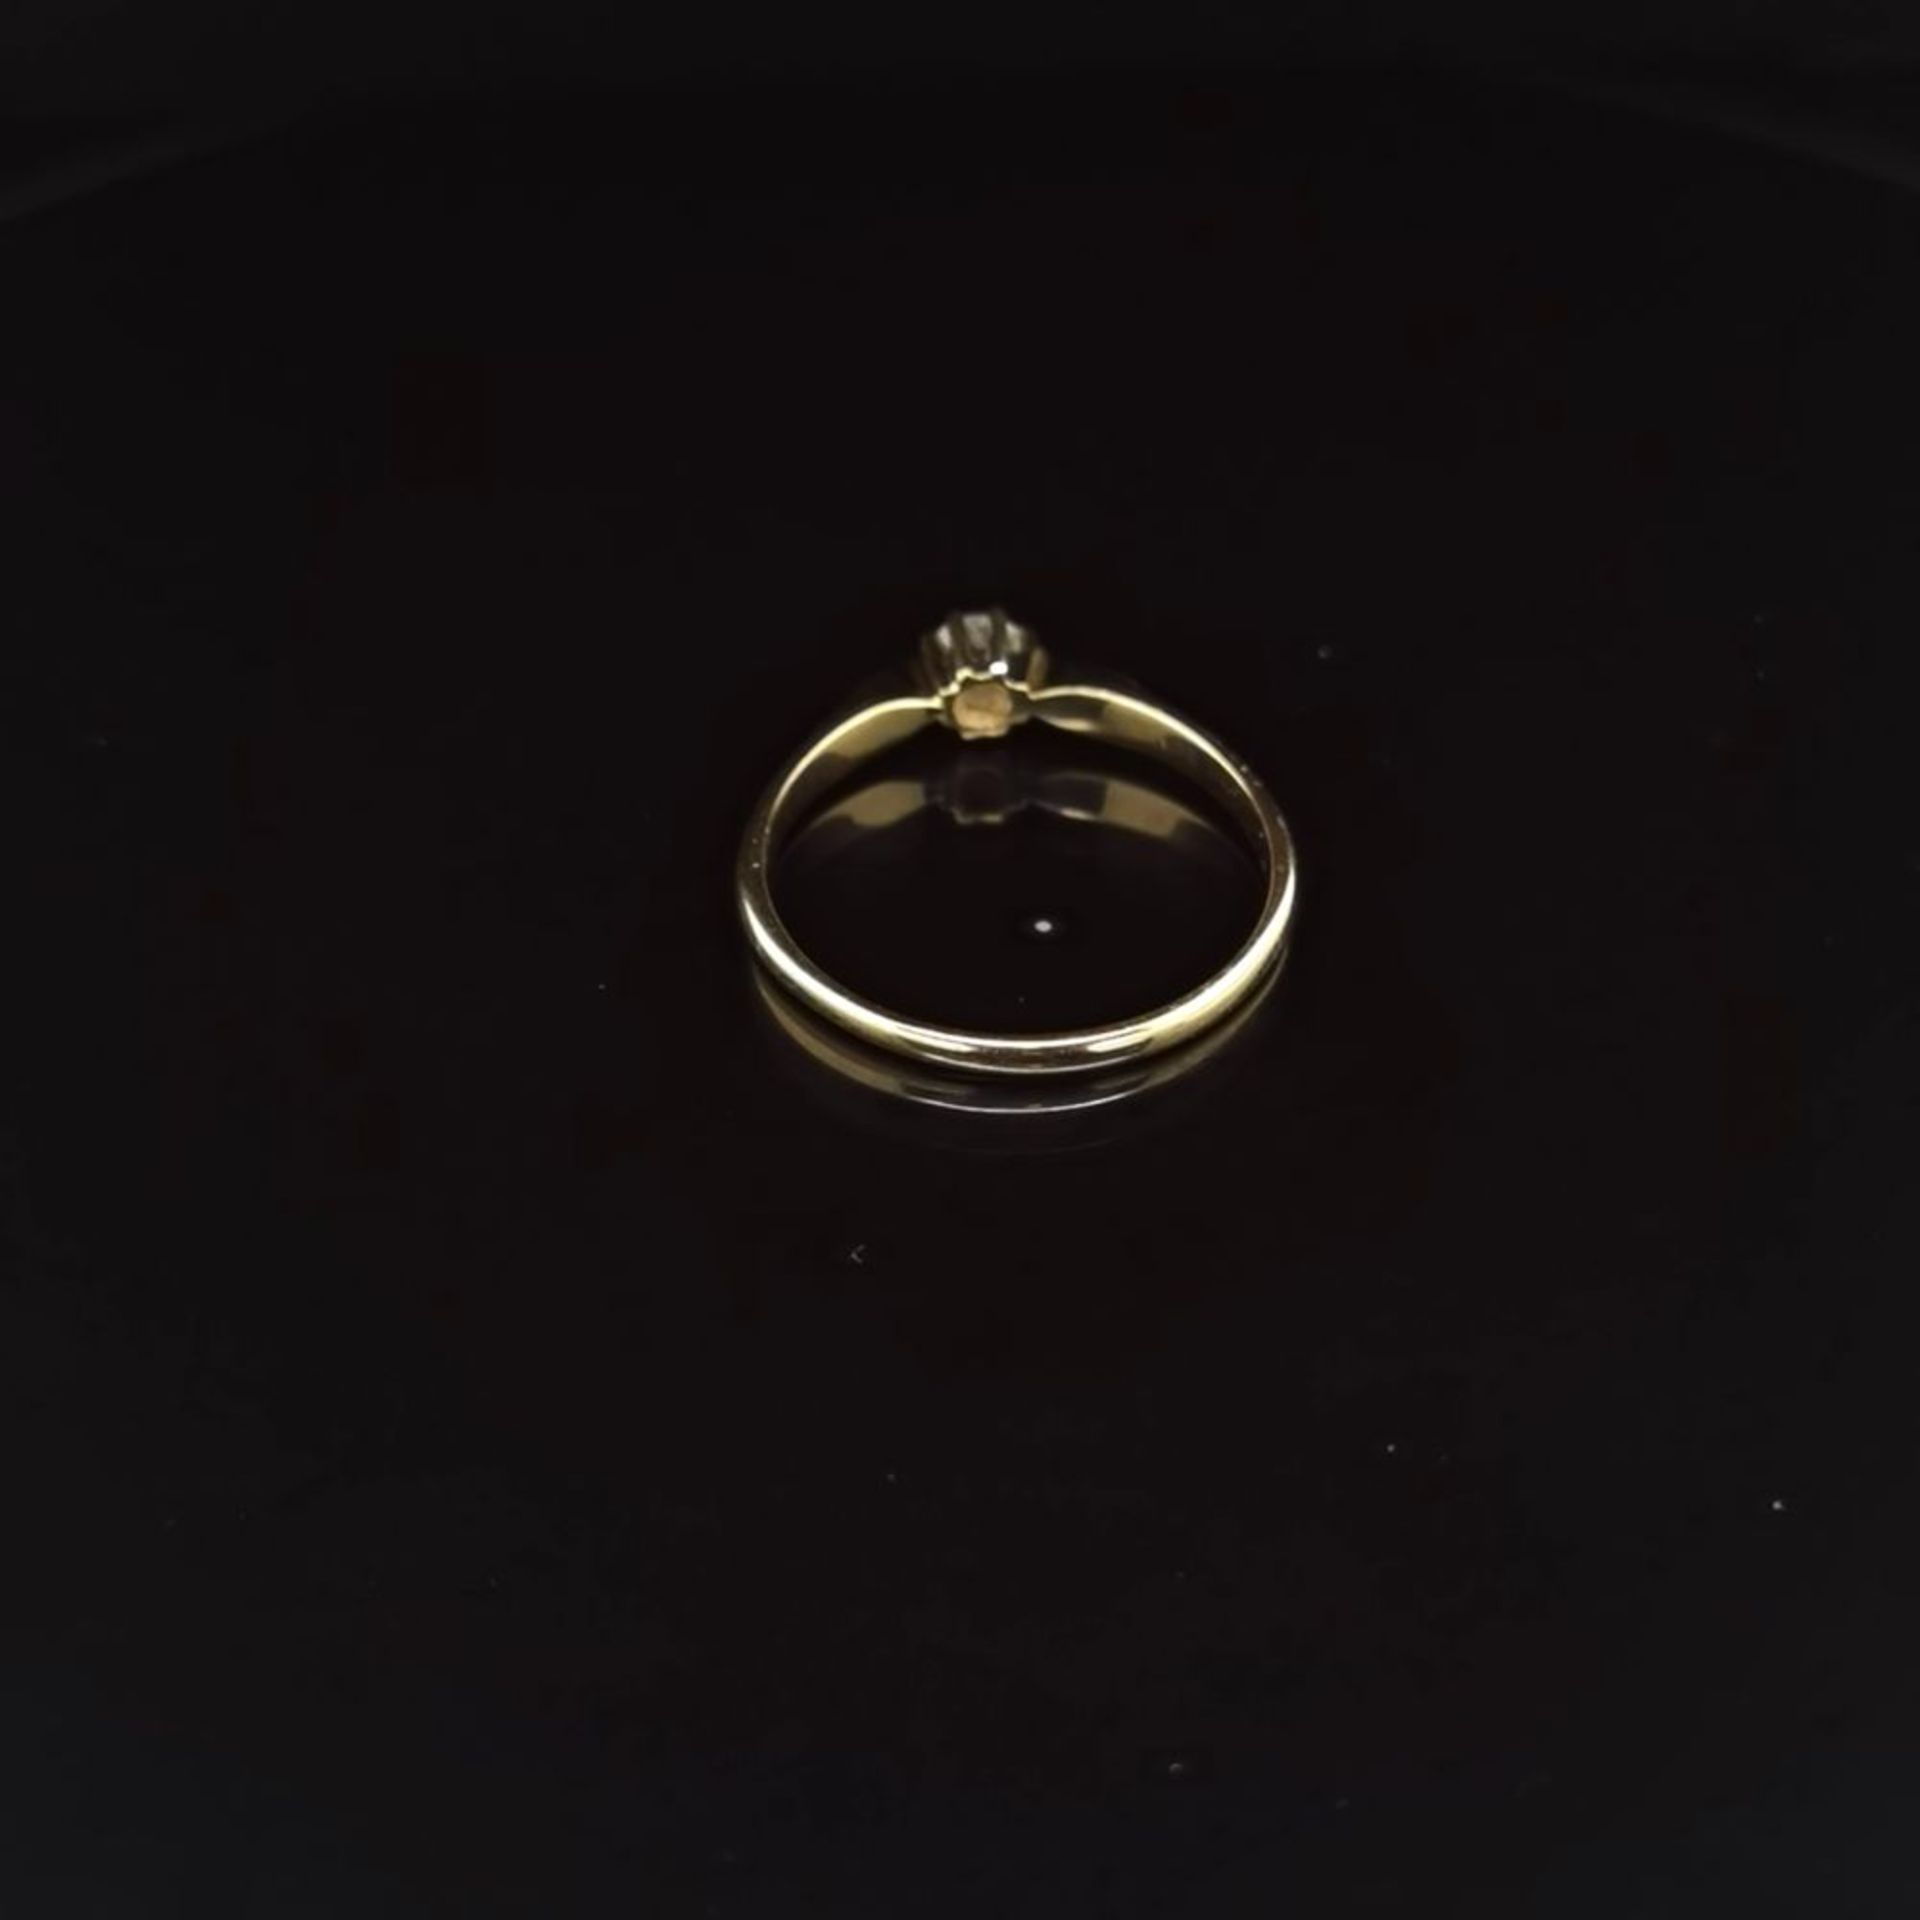 Brillant-Ring, 585 Gelbgold 2,3 - Image 3 of 3